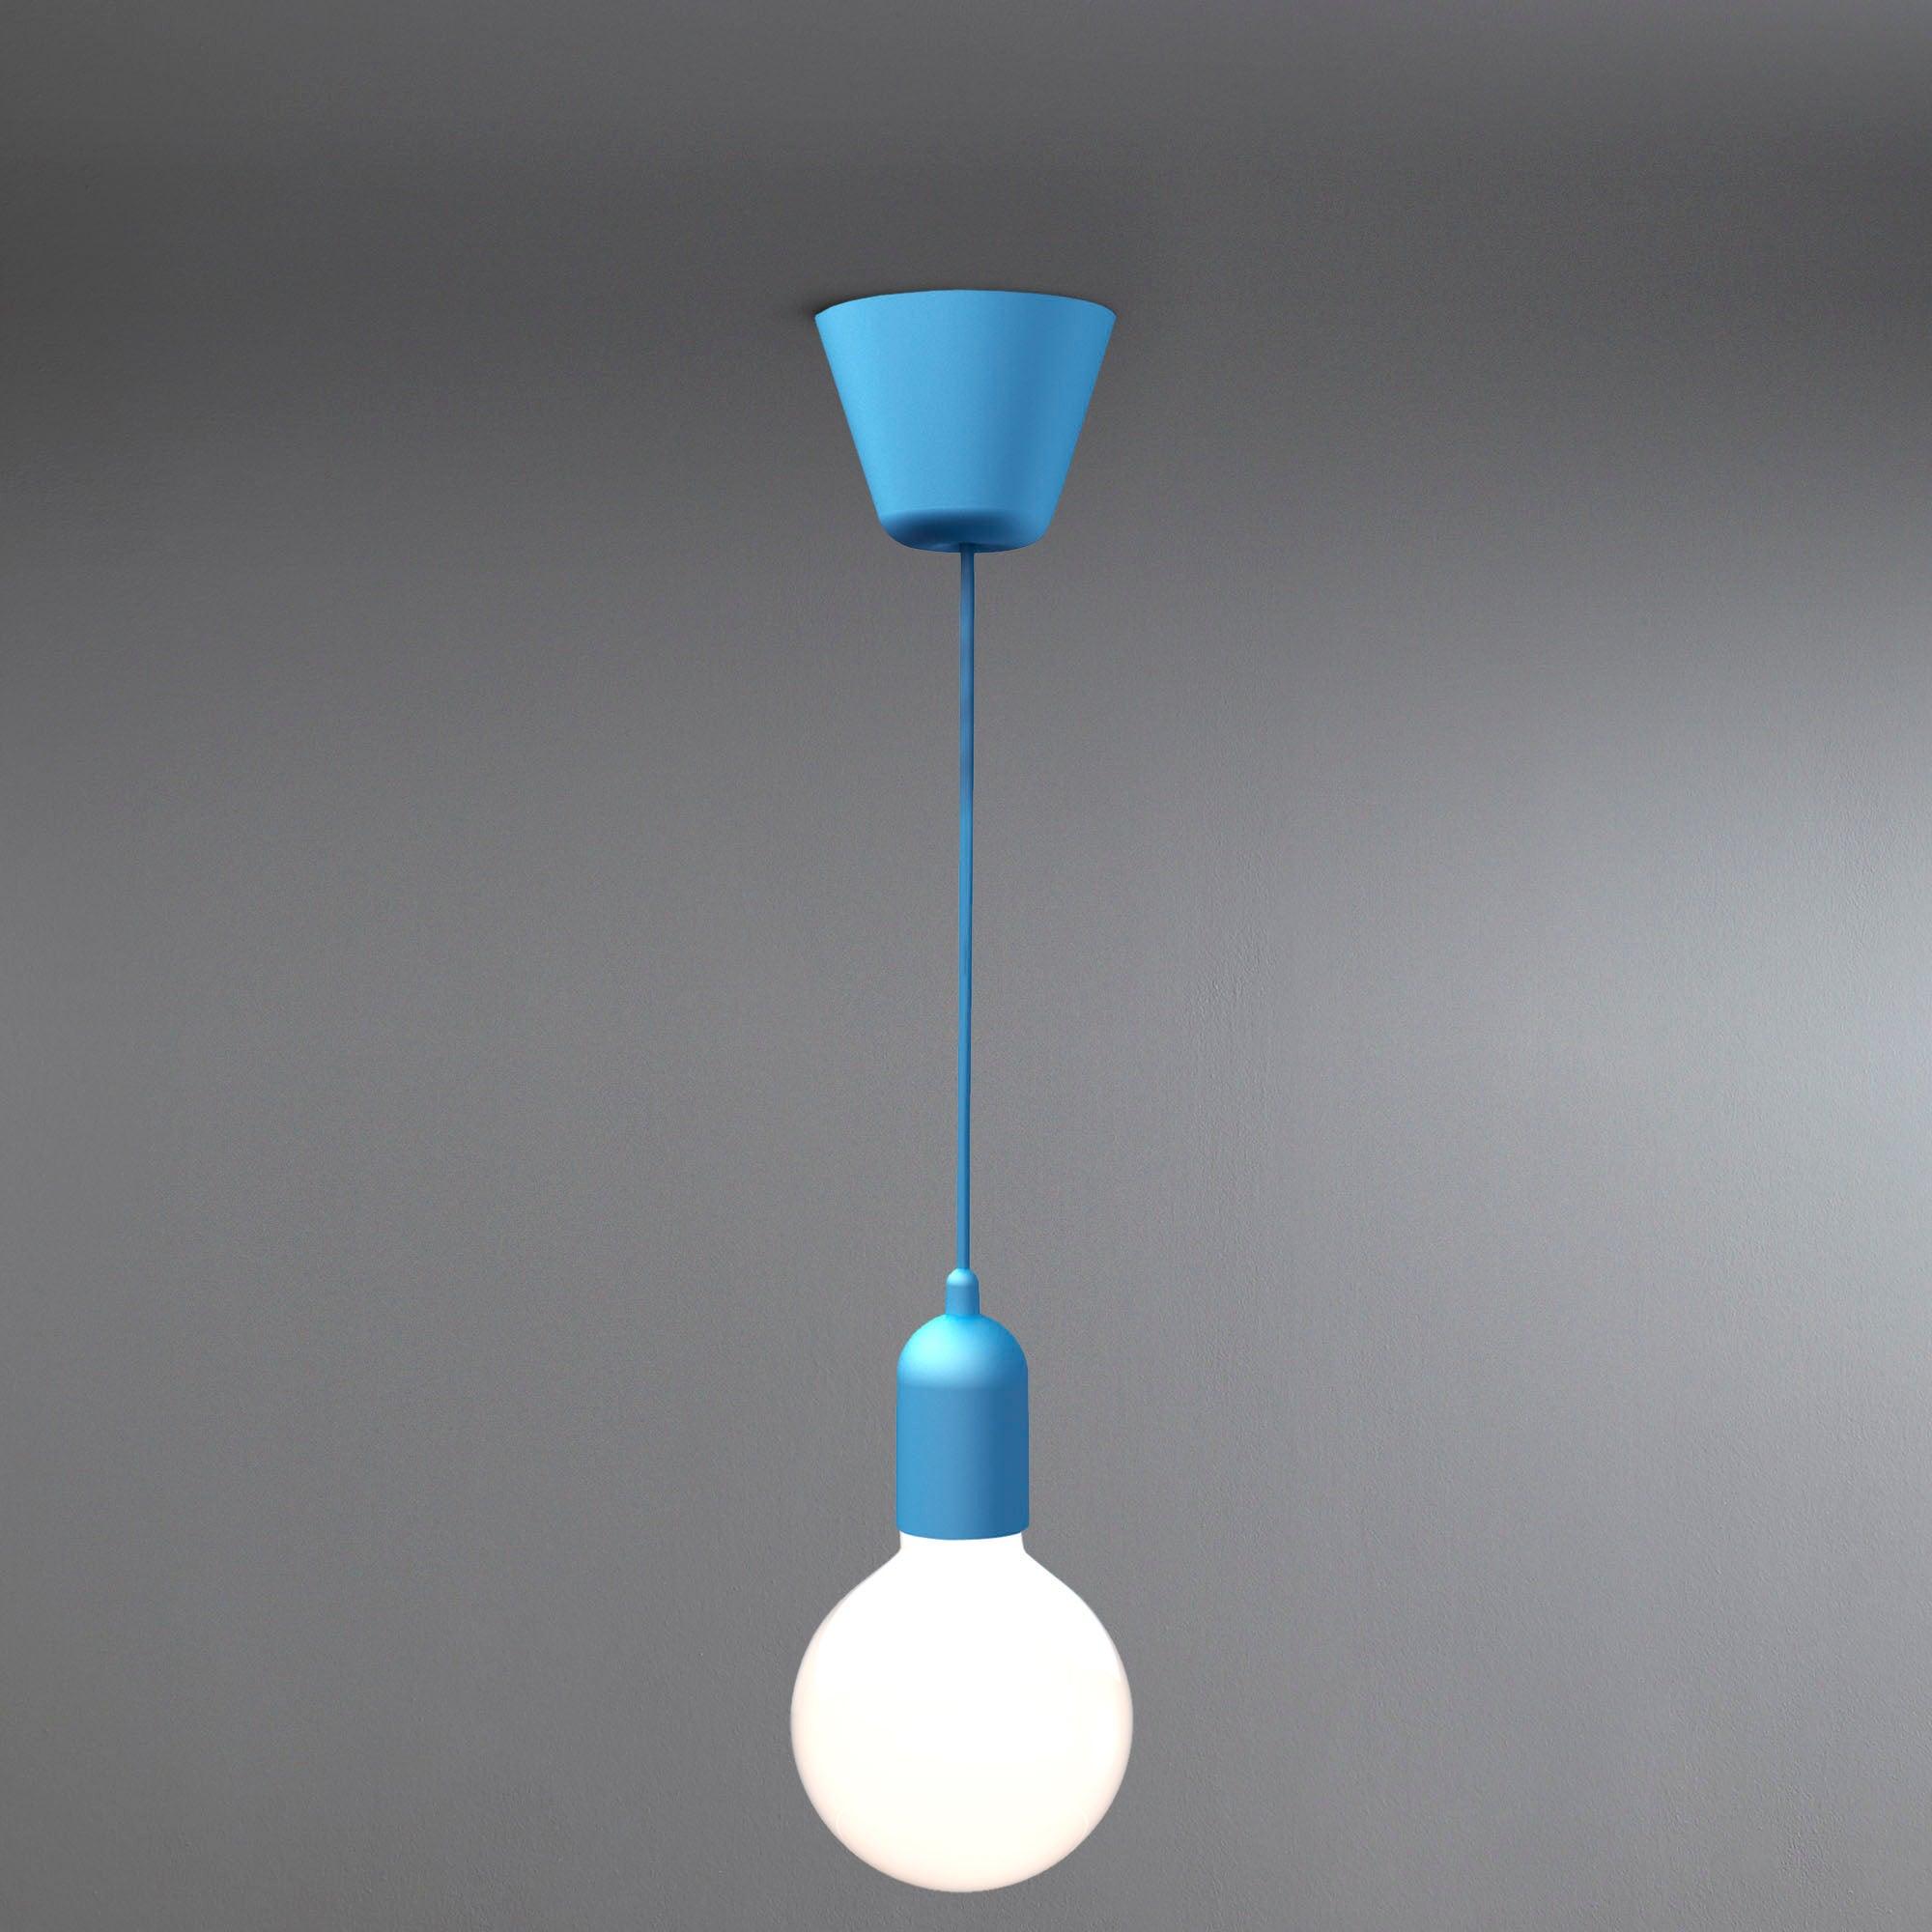 Photo of Funk suspension light blue light fitting blue